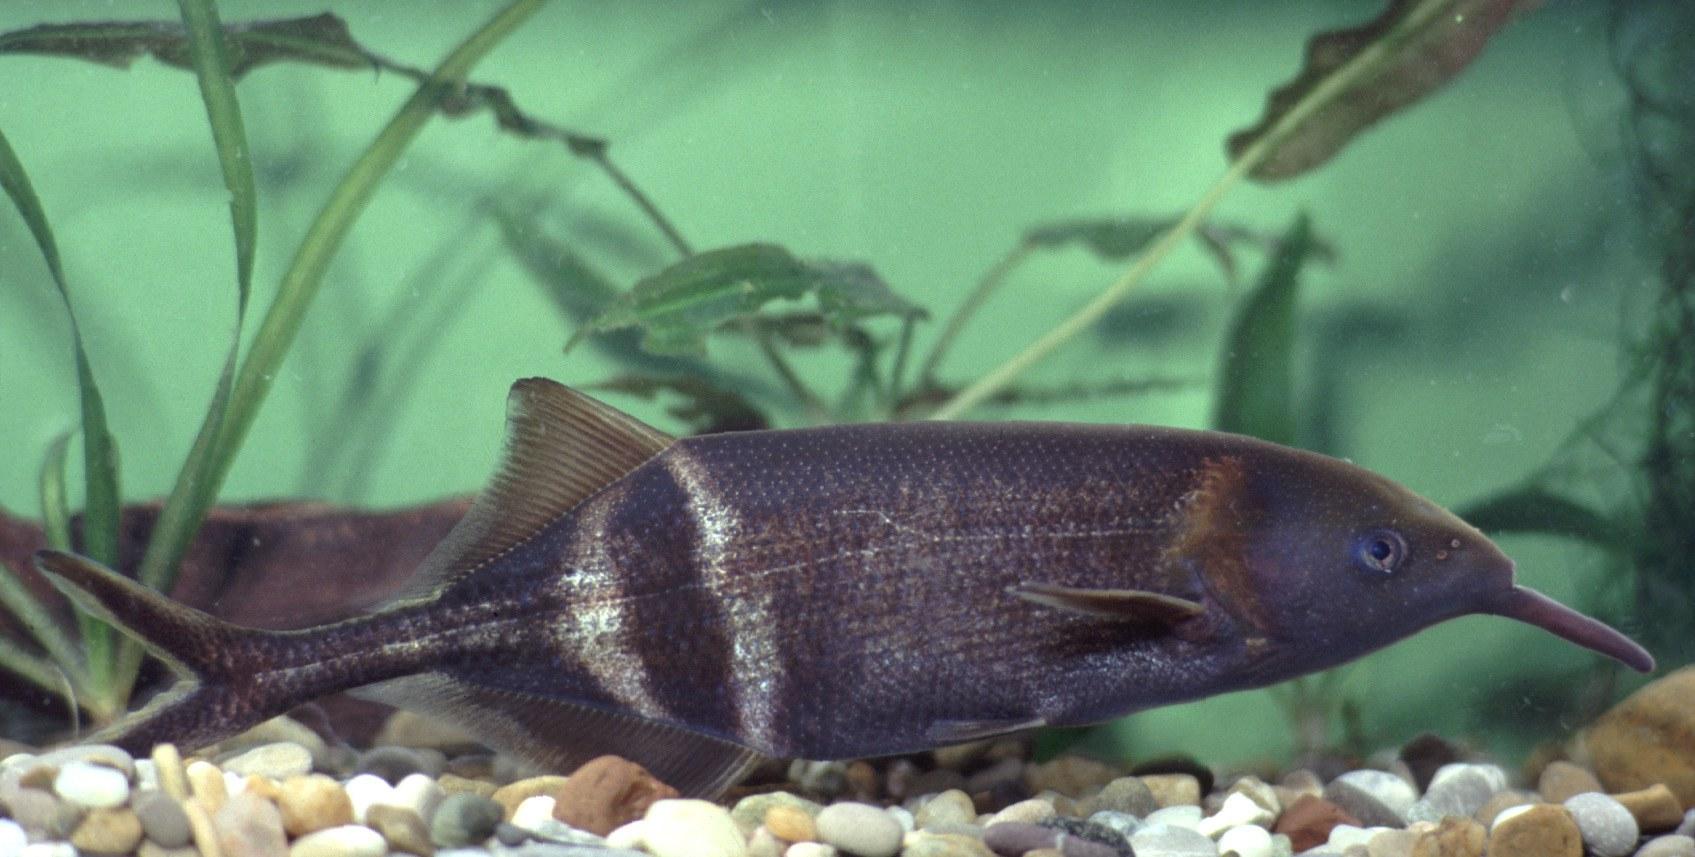 Bild Afrikanischer Fisch soll Herzkranken helfen